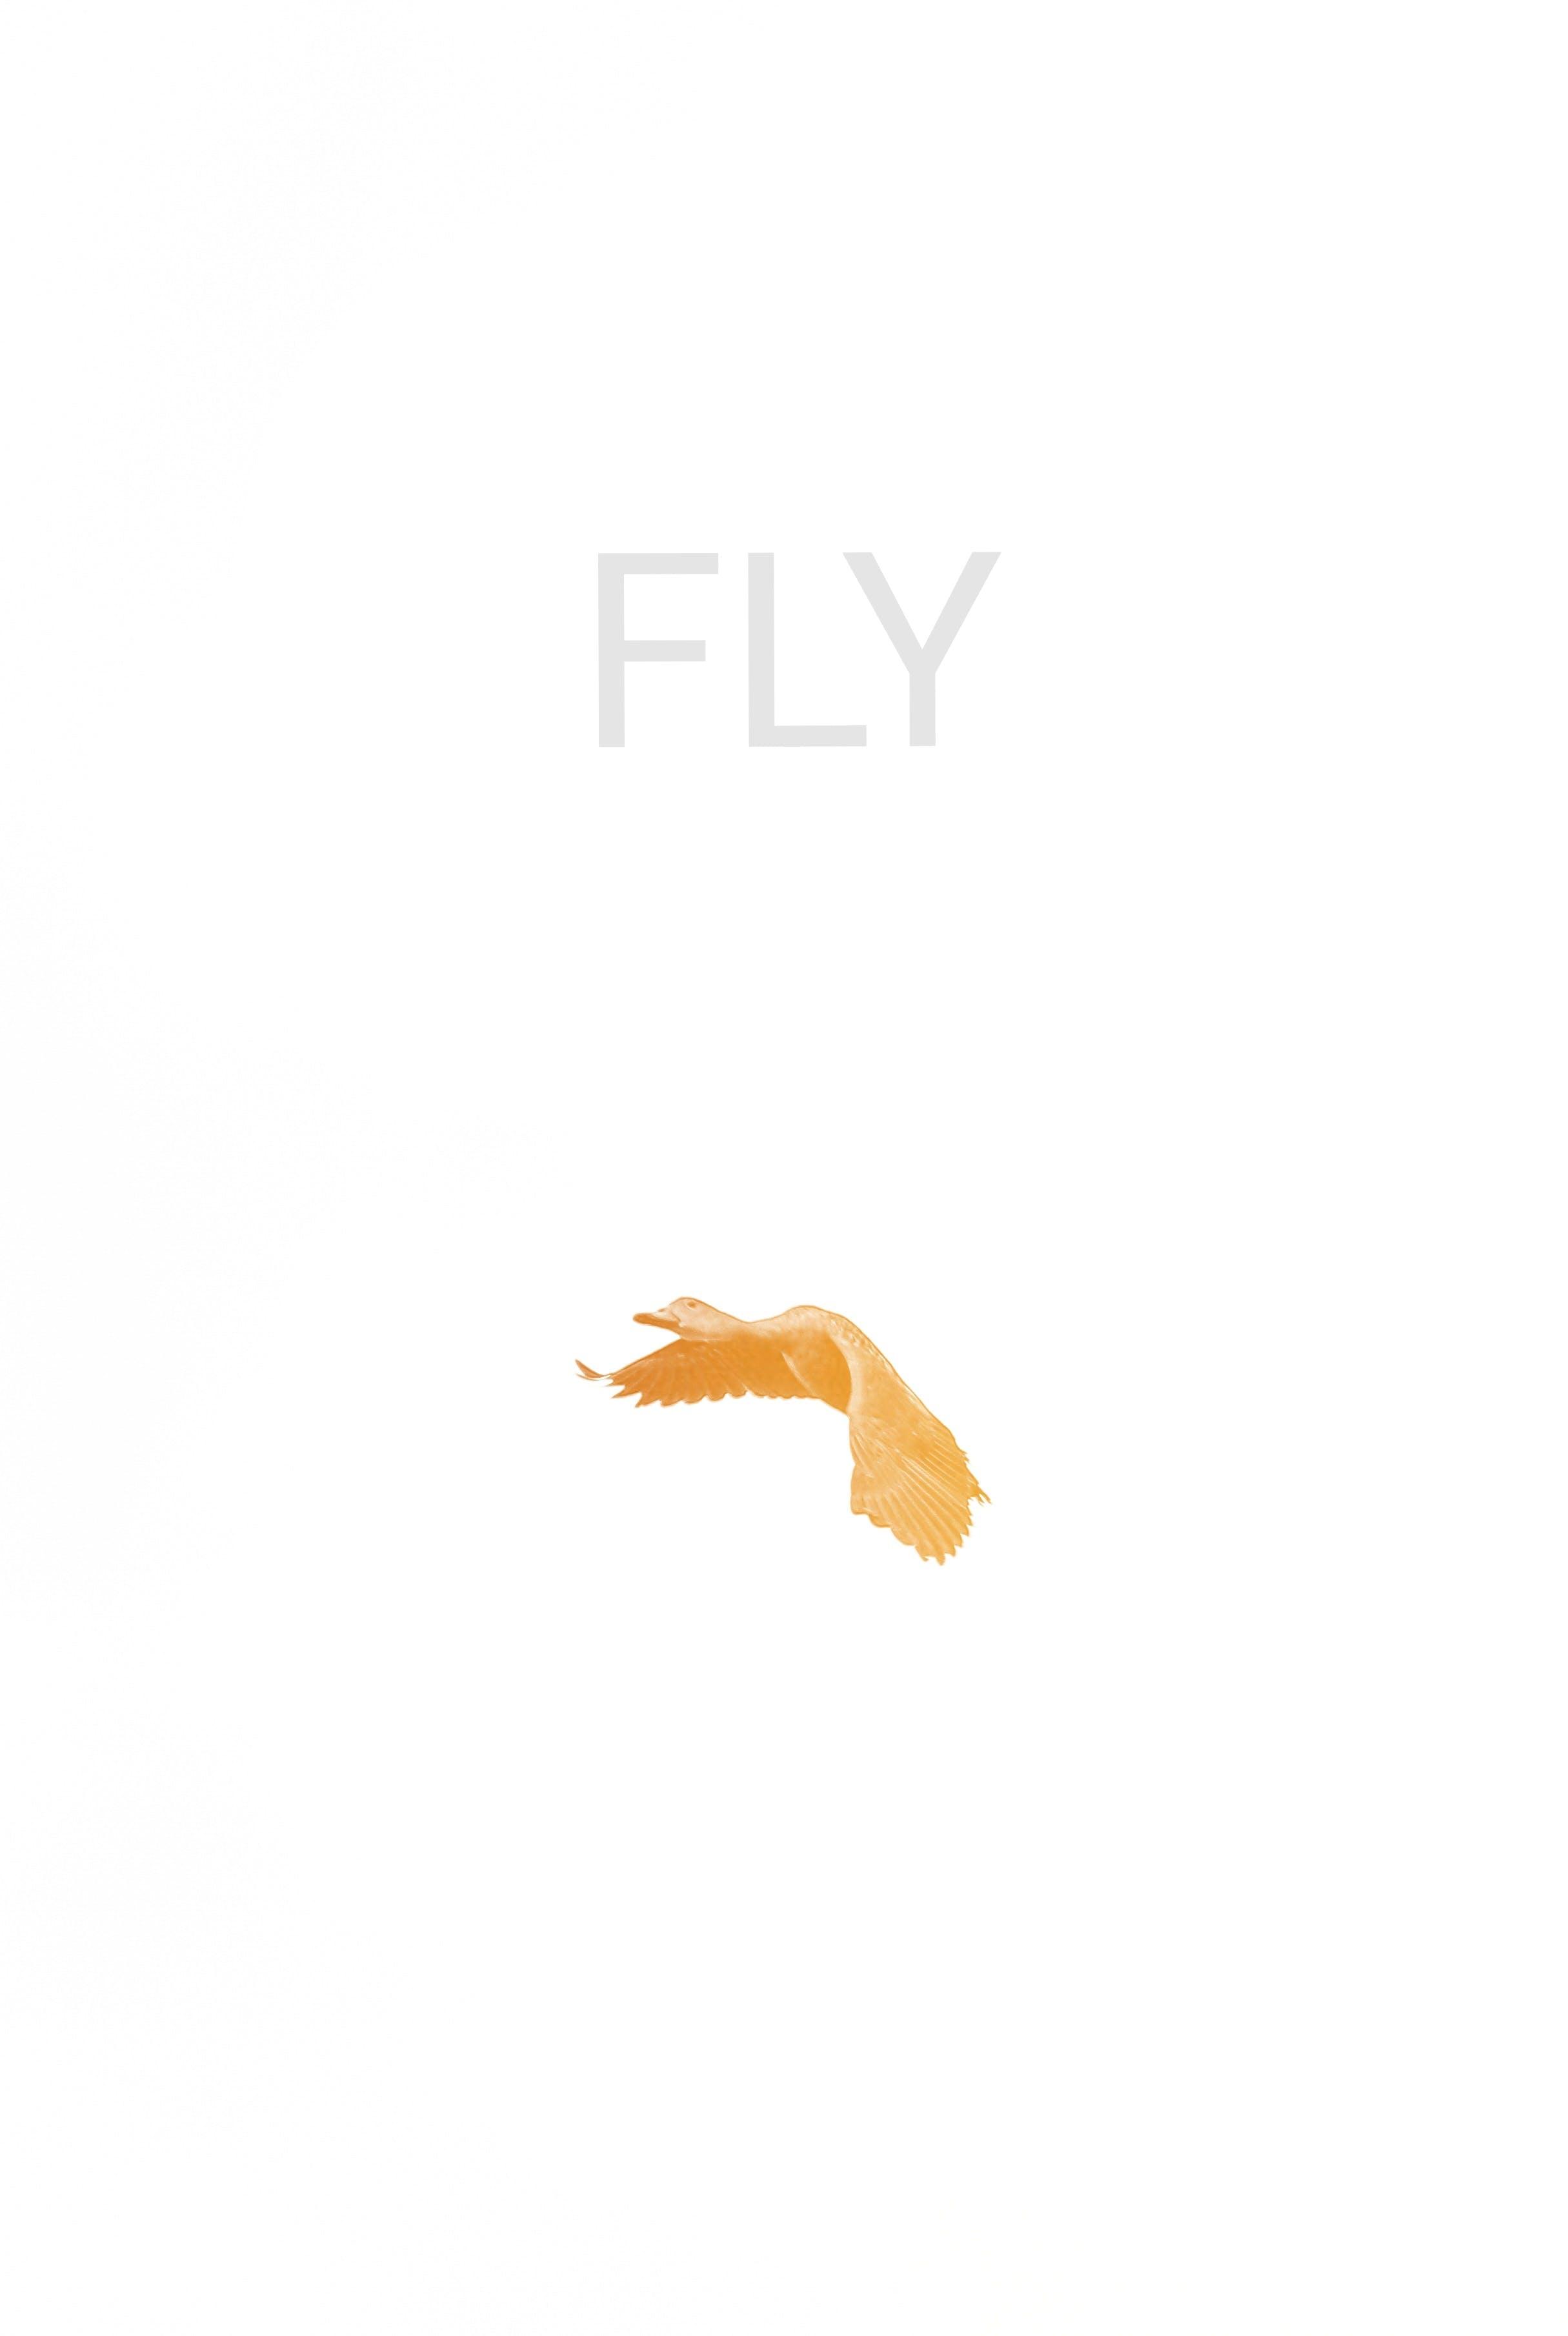 Free stock photo of bird, text